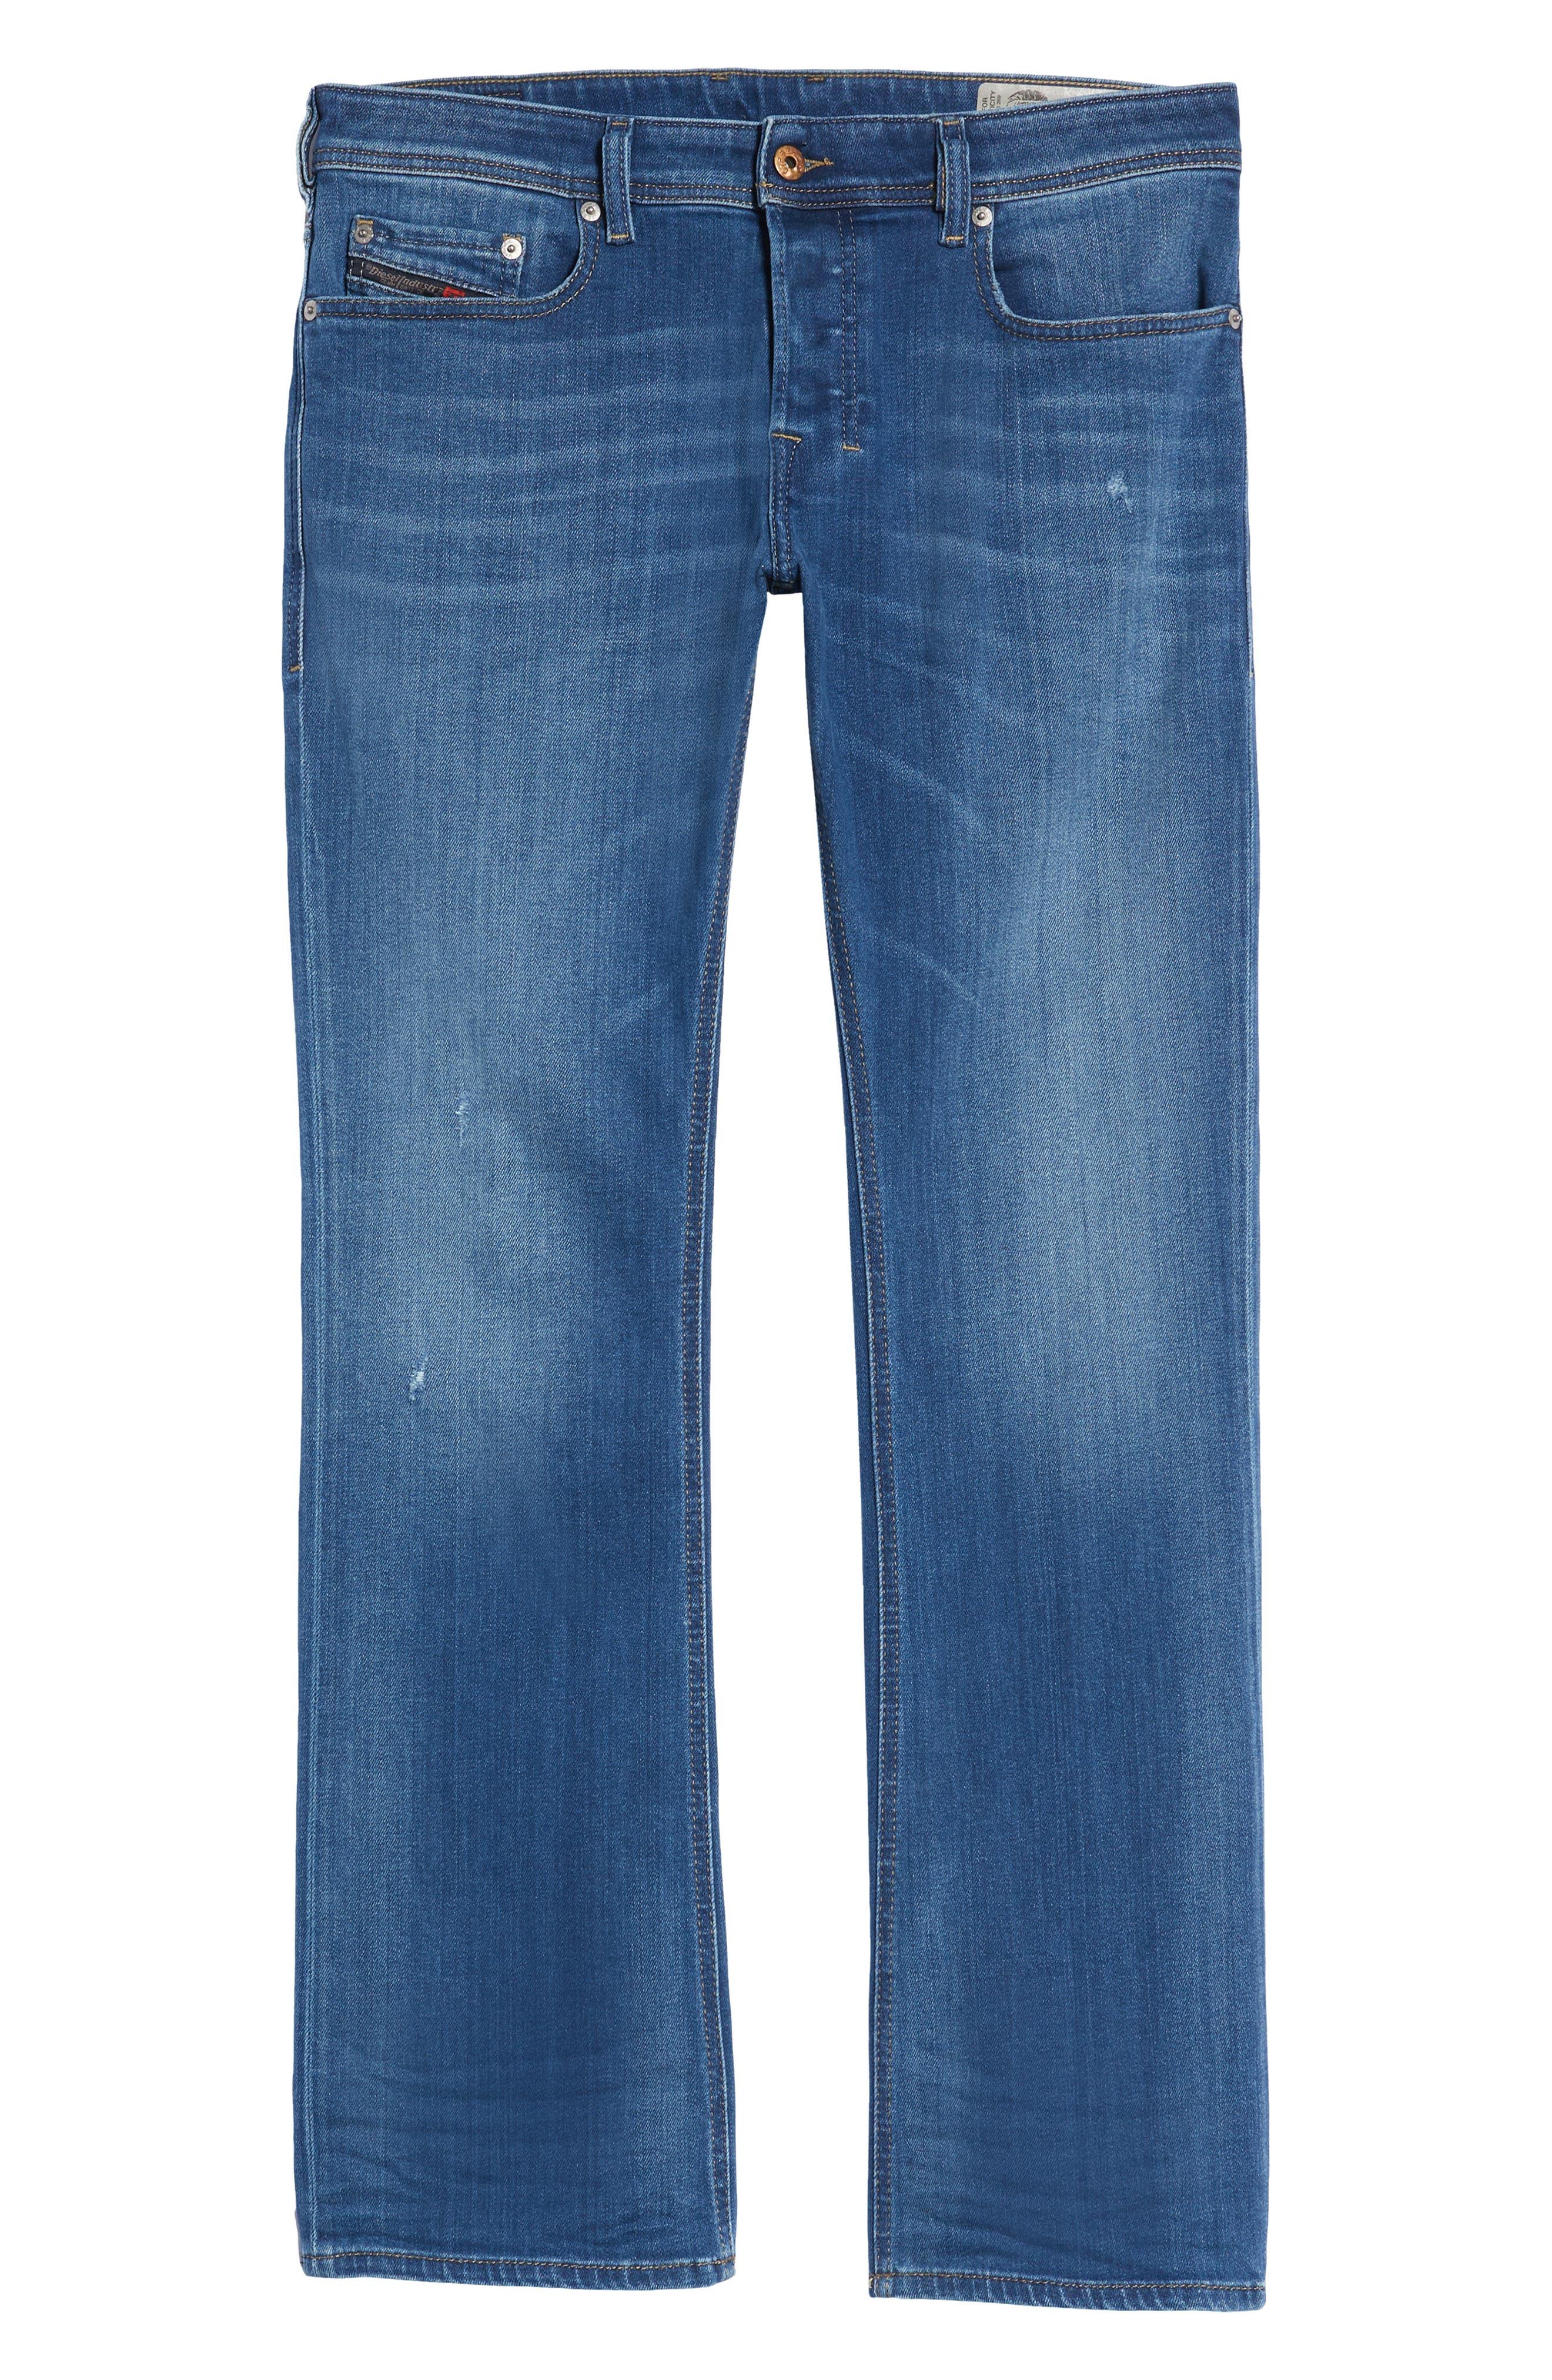 Zatiny Bootcut Jeans,                             Alternate thumbnail 6, color,                             084Qq